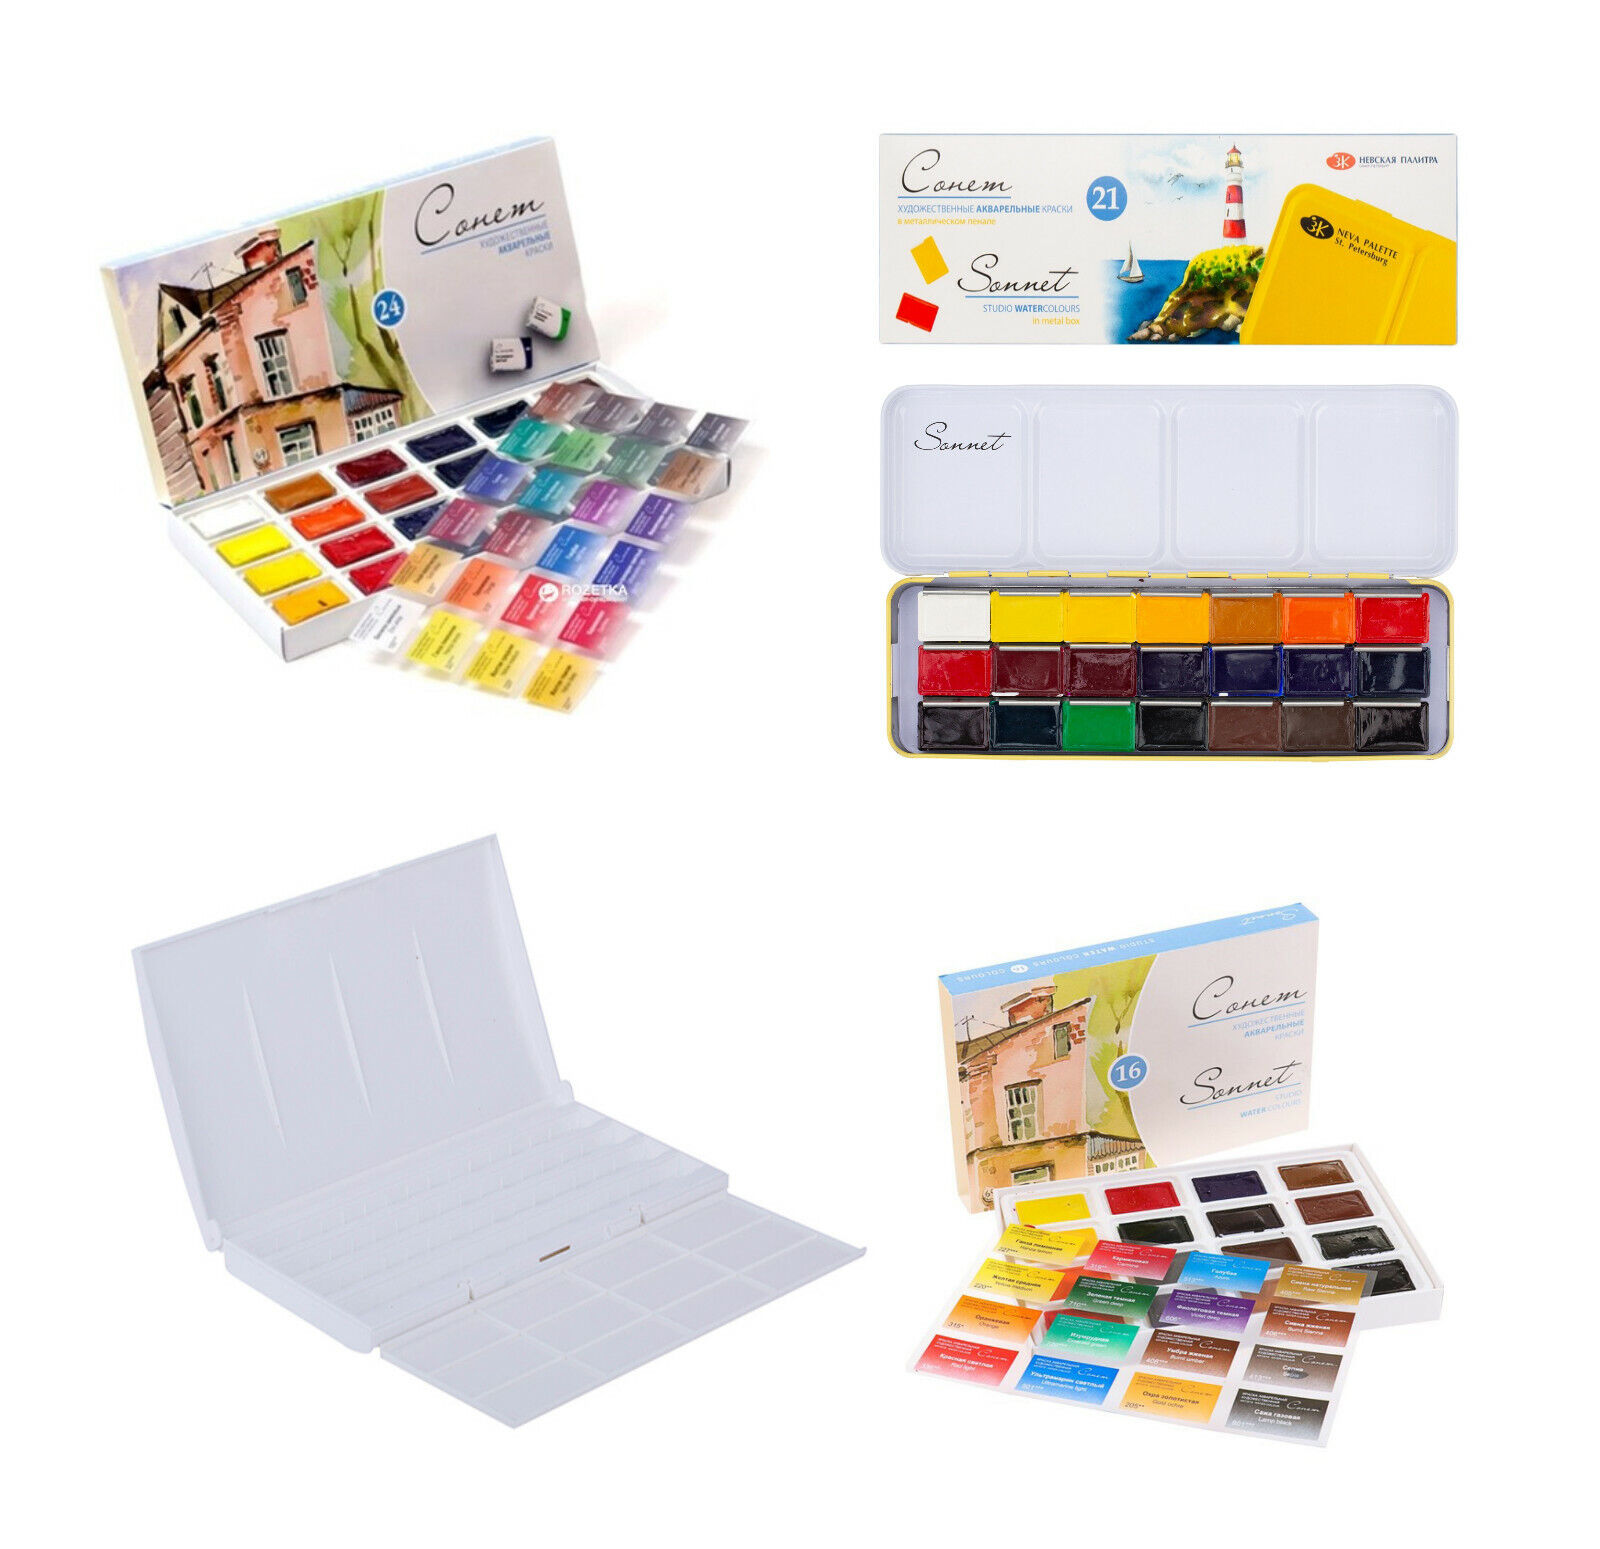 Sonnet 16, 21 oder 24 Farben Aquarellfarben Sonnet, optional Kunststoffbox